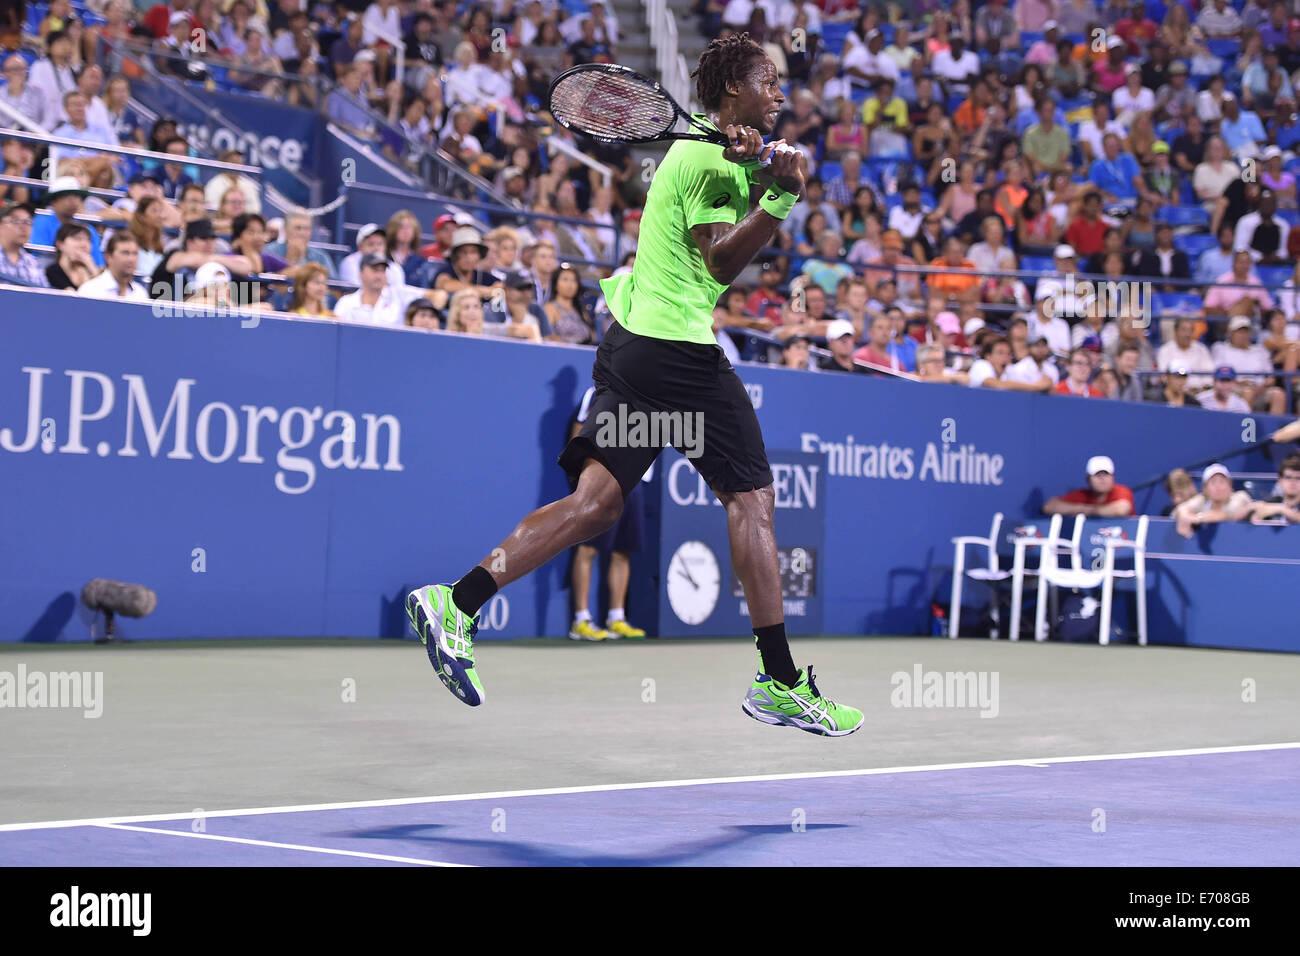 Flushing Meadows, New York, USA  31st Aug, 2014  US Open